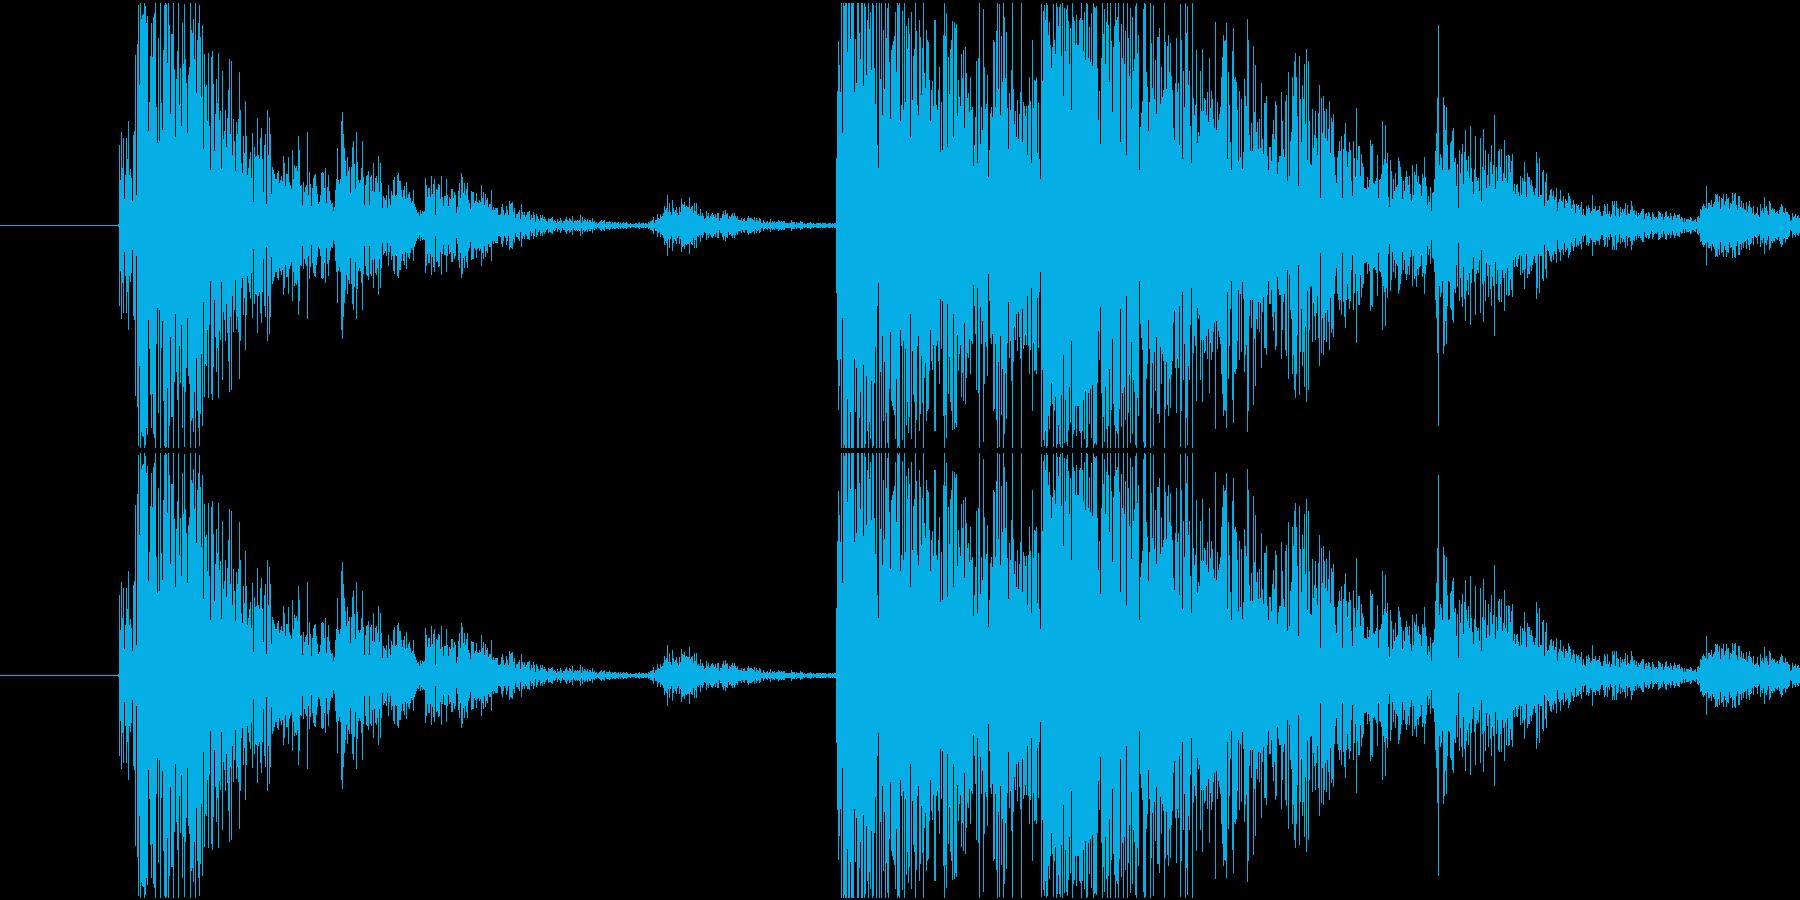 Material 工具を軽く投げ置く音の再生済みの波形